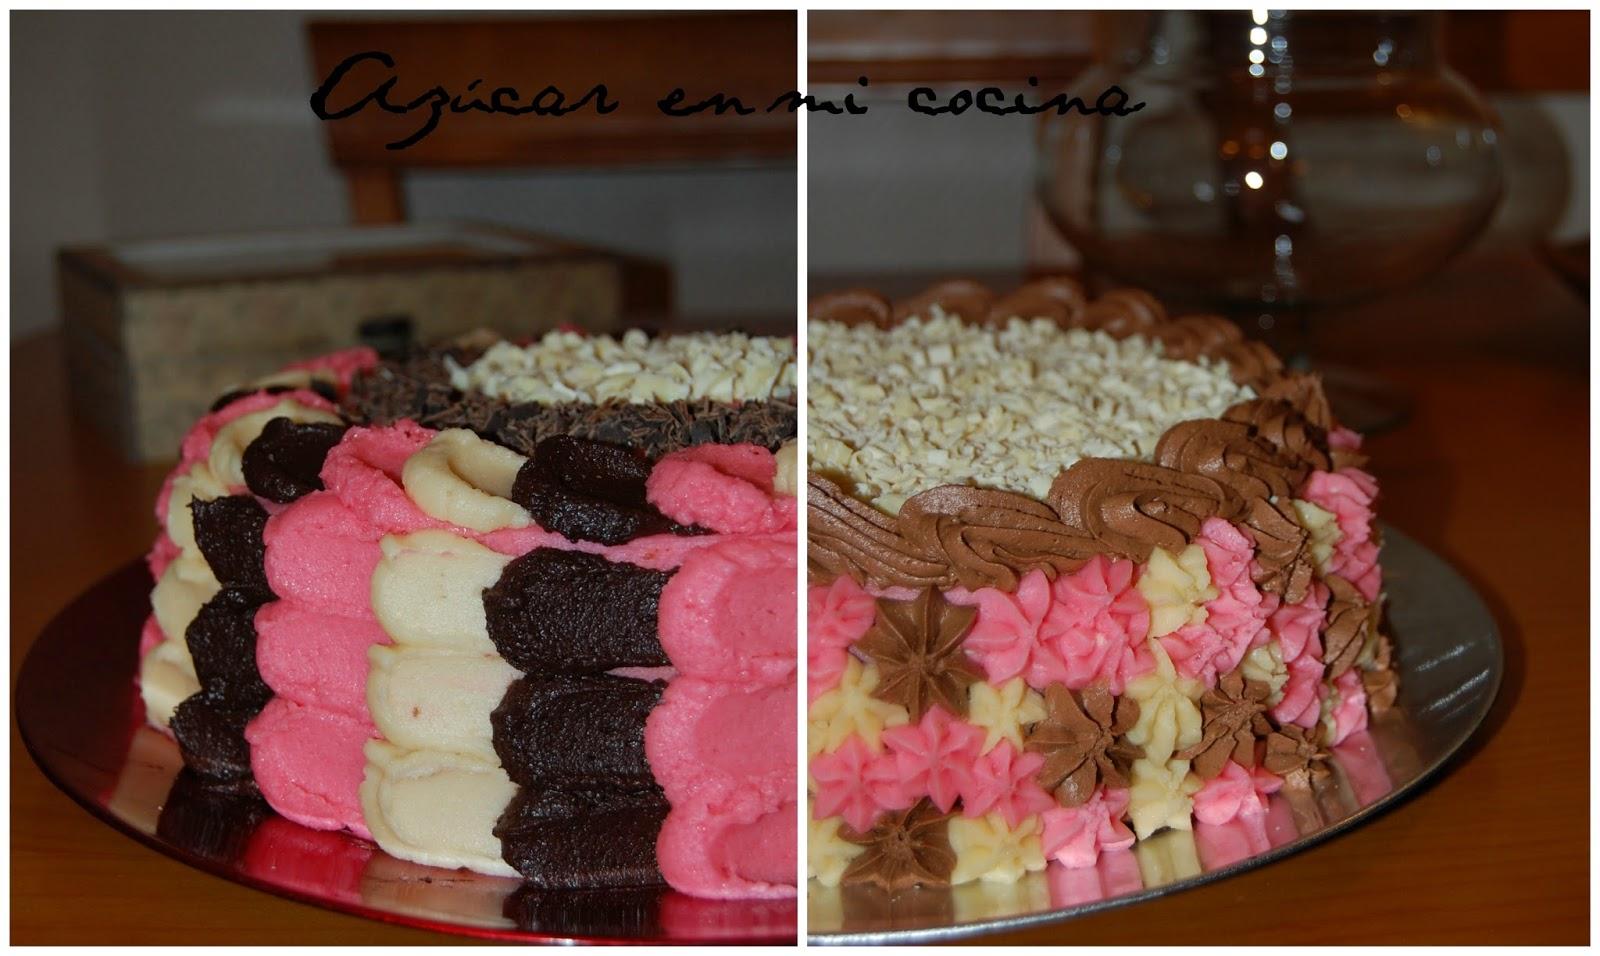 http://azucarenmicocina.blogspot.com.es/2013/01/tarta-trer-sabores-y-dos-formas-de.html